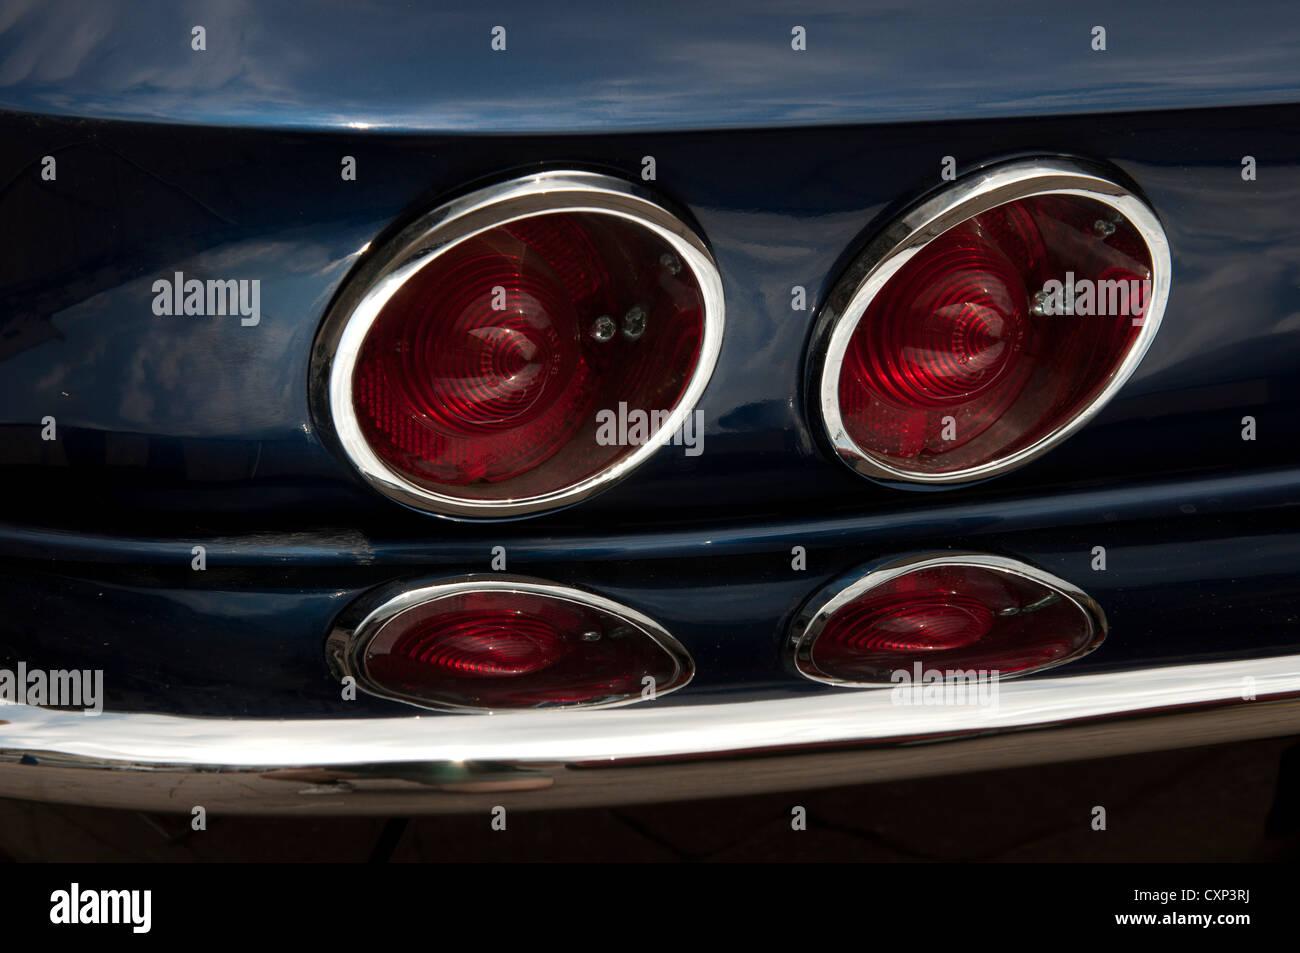 1966 Corvette Sting Ray tail lights - Stock Image